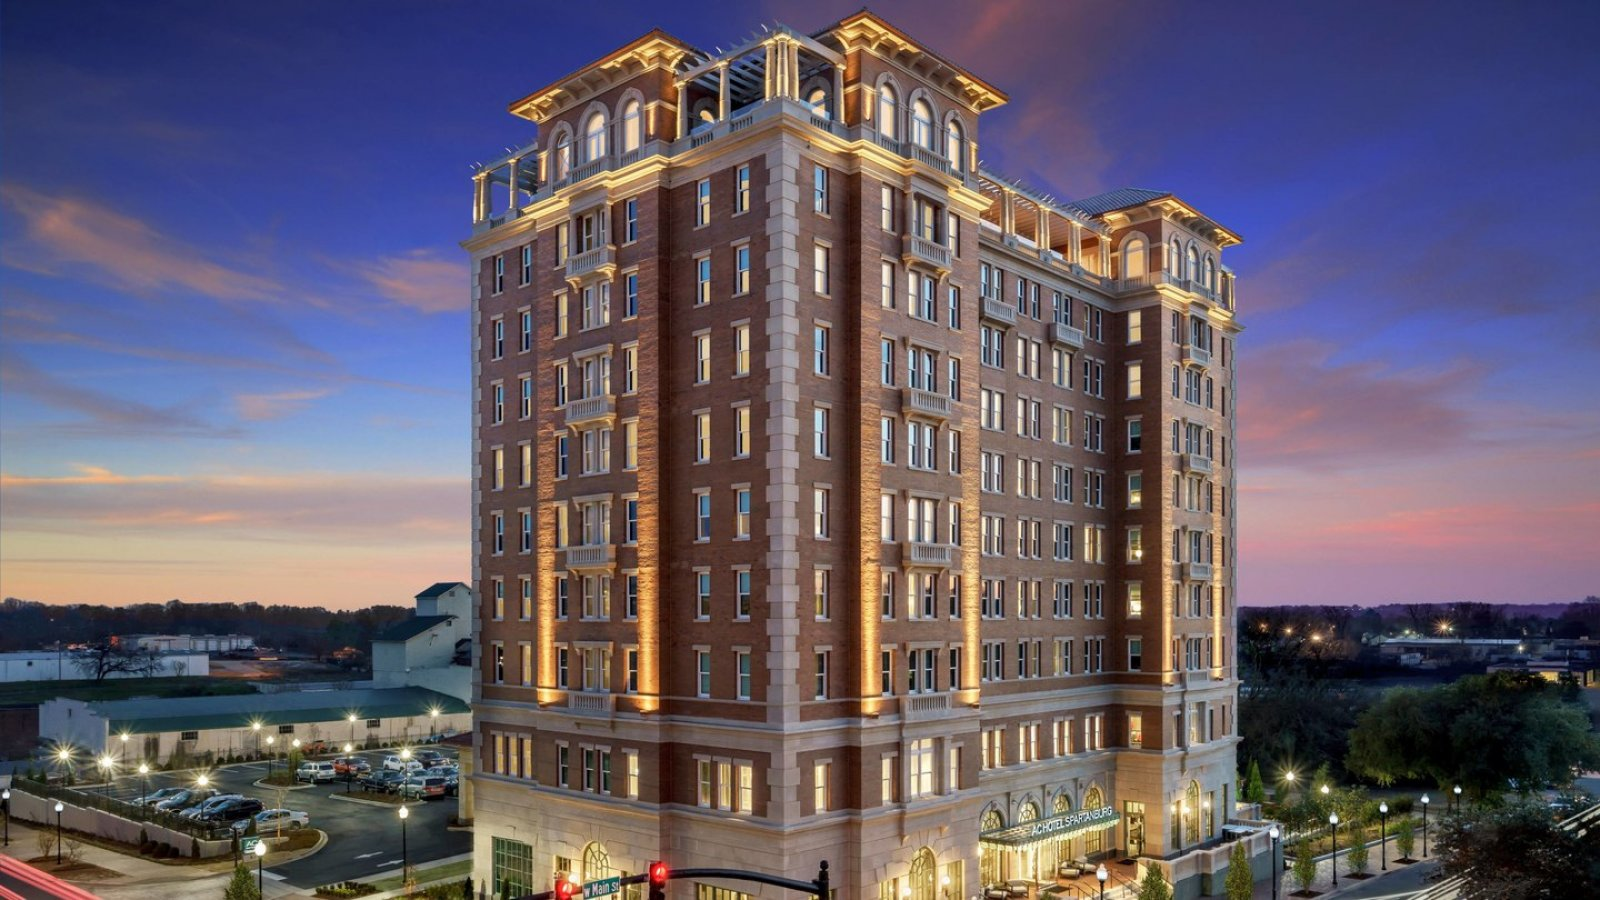 AC Hotel Spartanburg